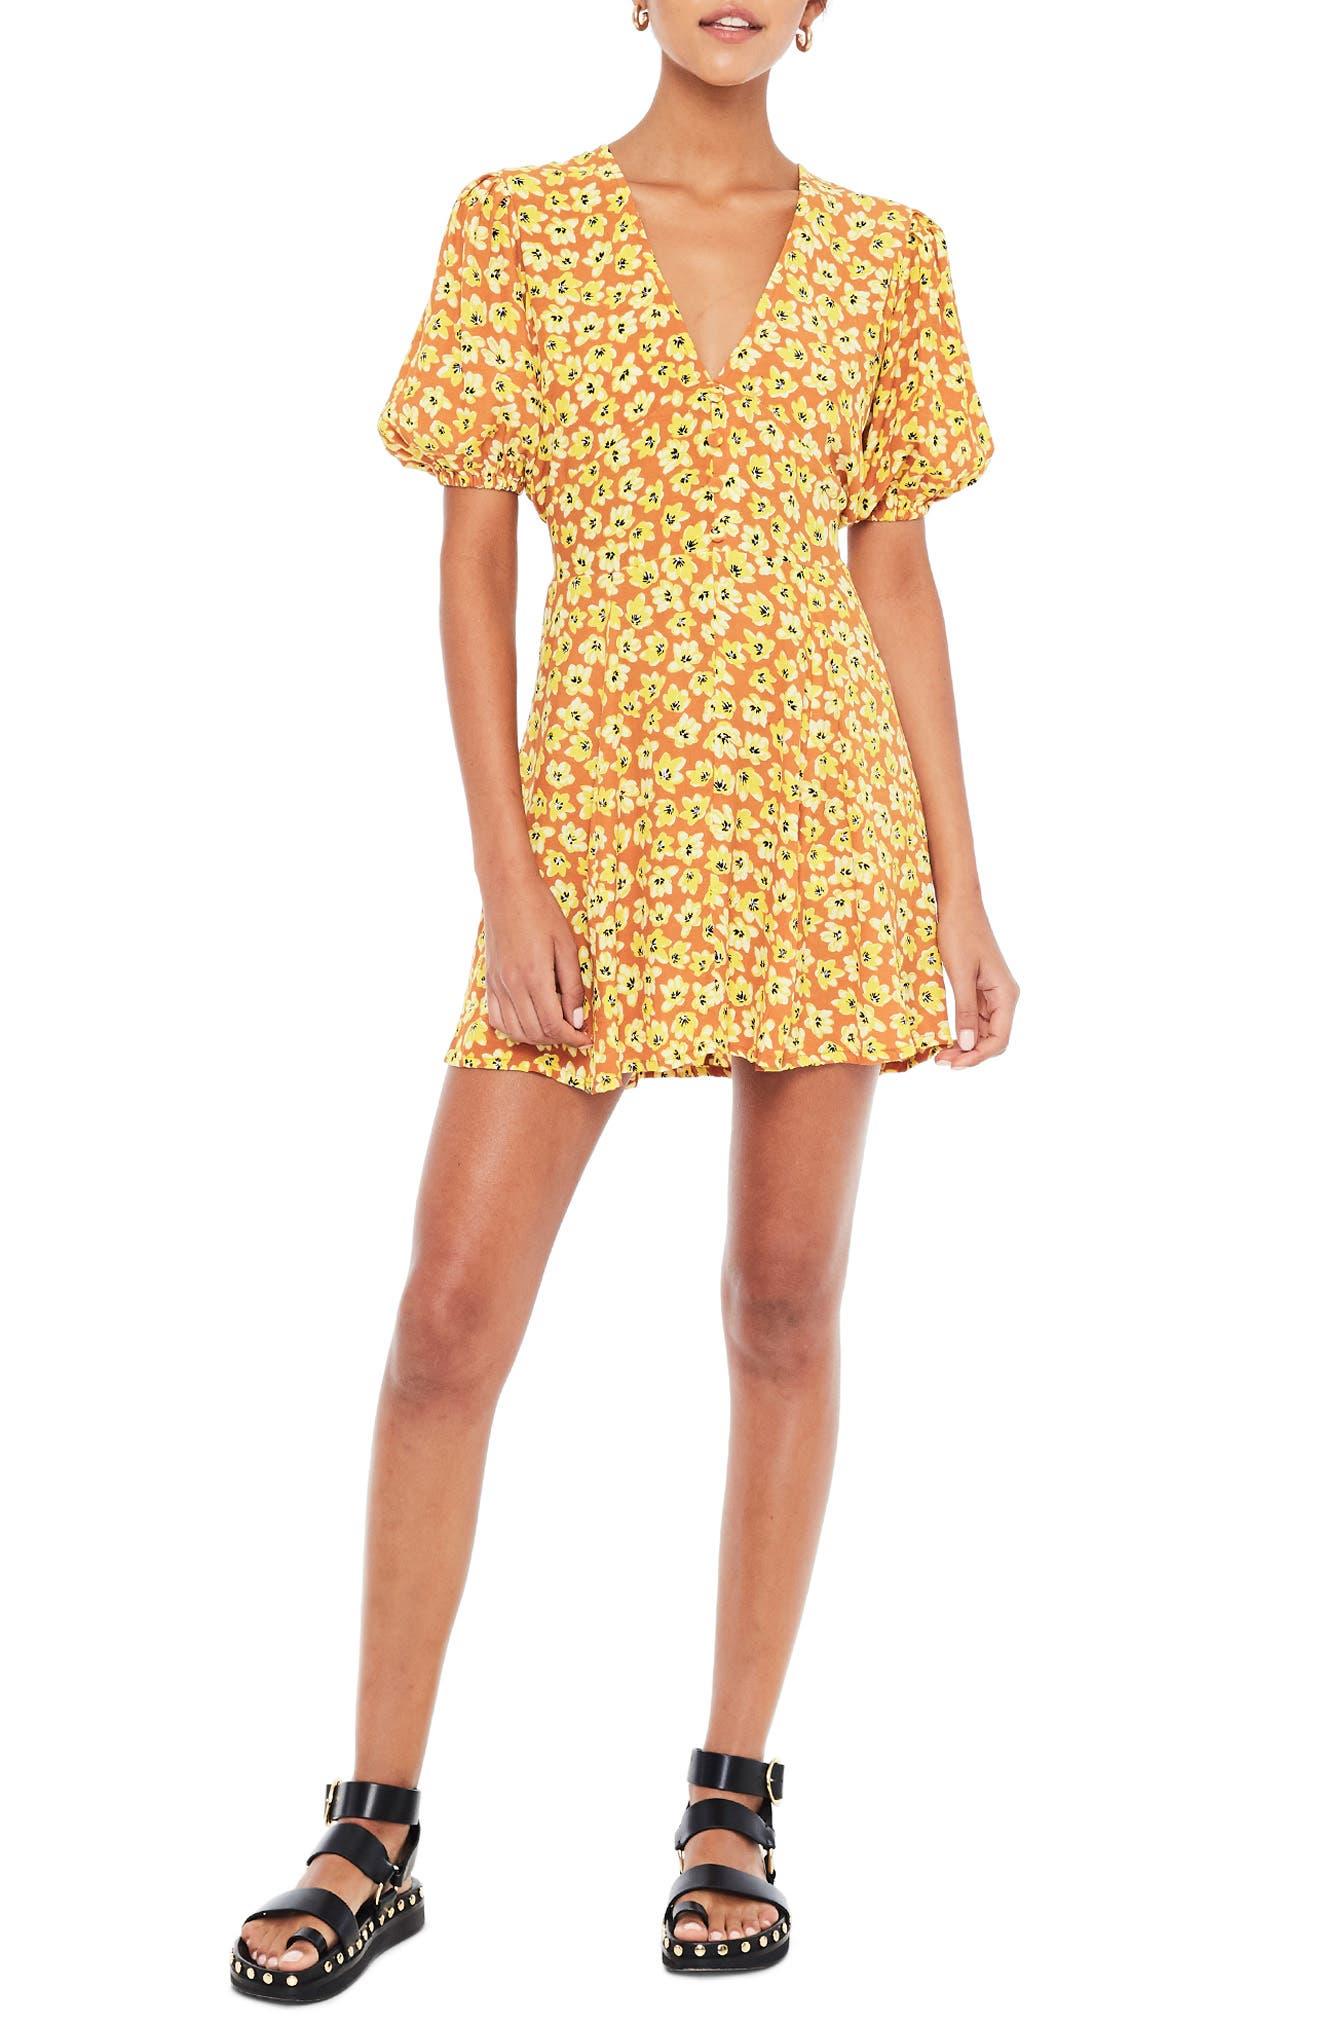 Faithfull The Brand Ilia Floral Minidress, Orange